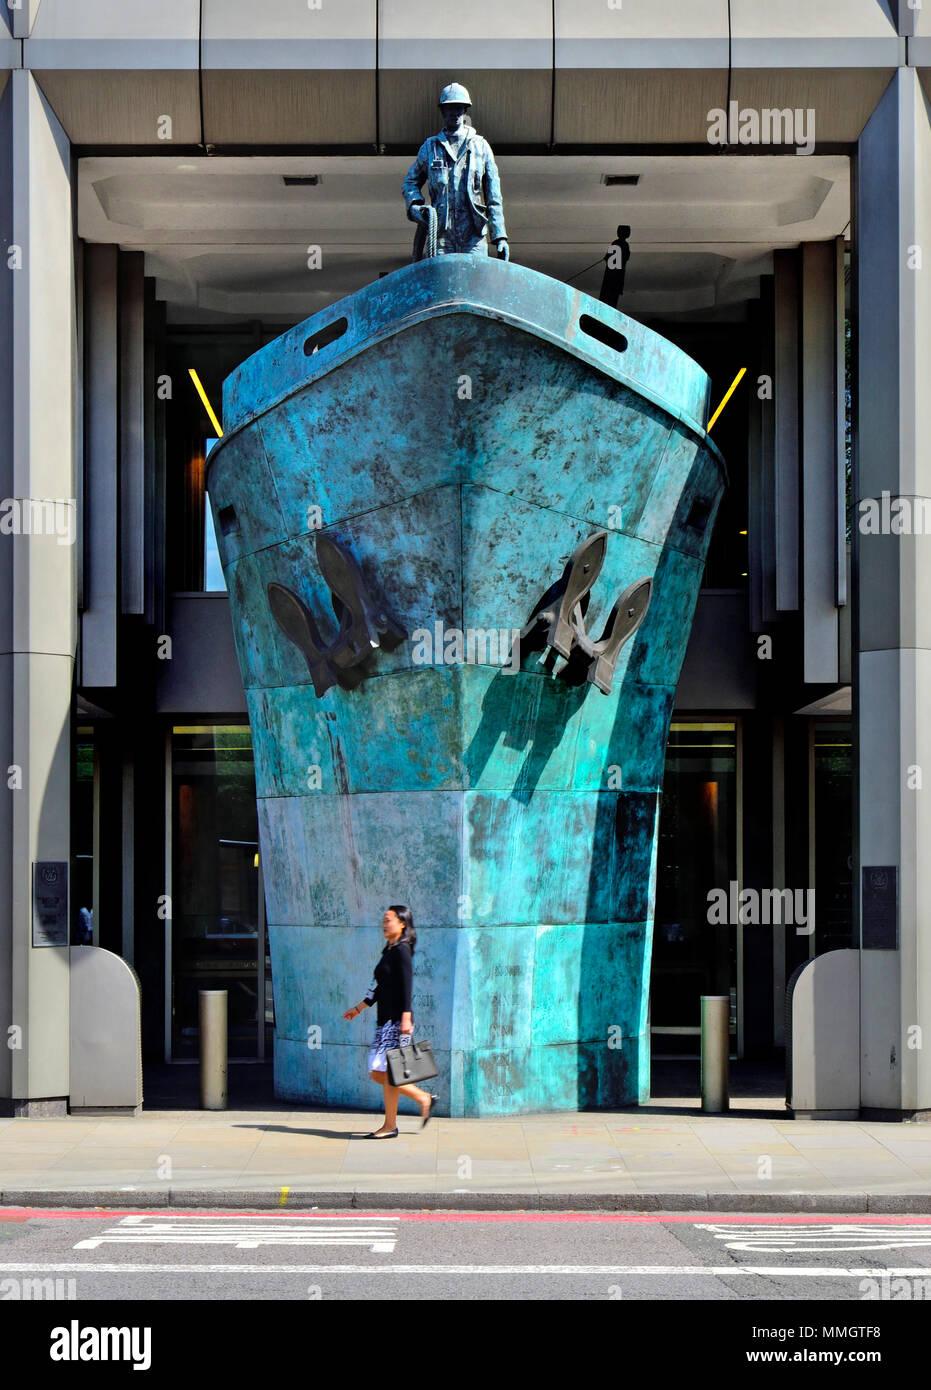 London, England, UK. International Memorial to Seafarers (2001; Michael Sandle) at the International Maritime Organisation, Albert Embankment, Lambeth.. - Stock Image